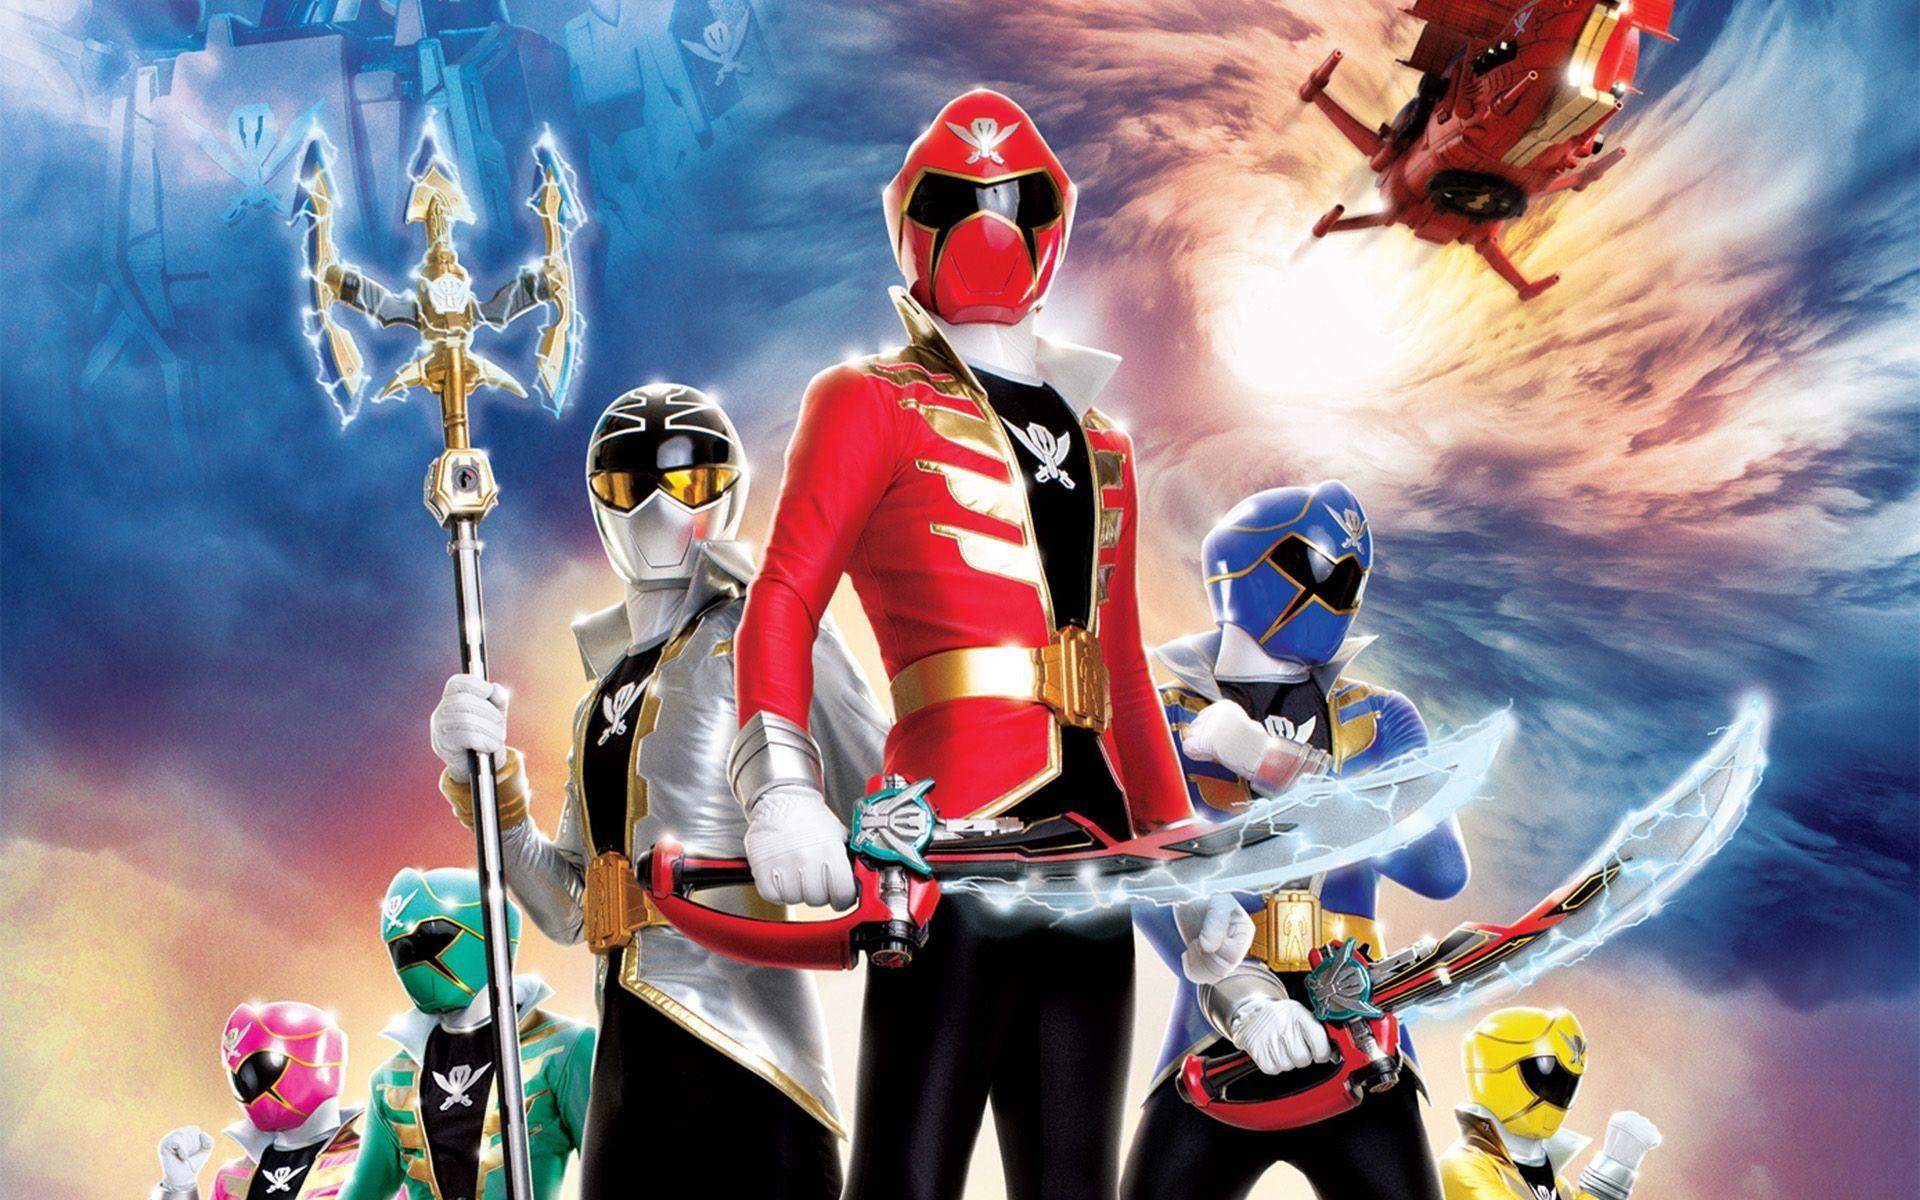 Power Rangers Super Megaforce Wallpaper For Windows M9x Movie